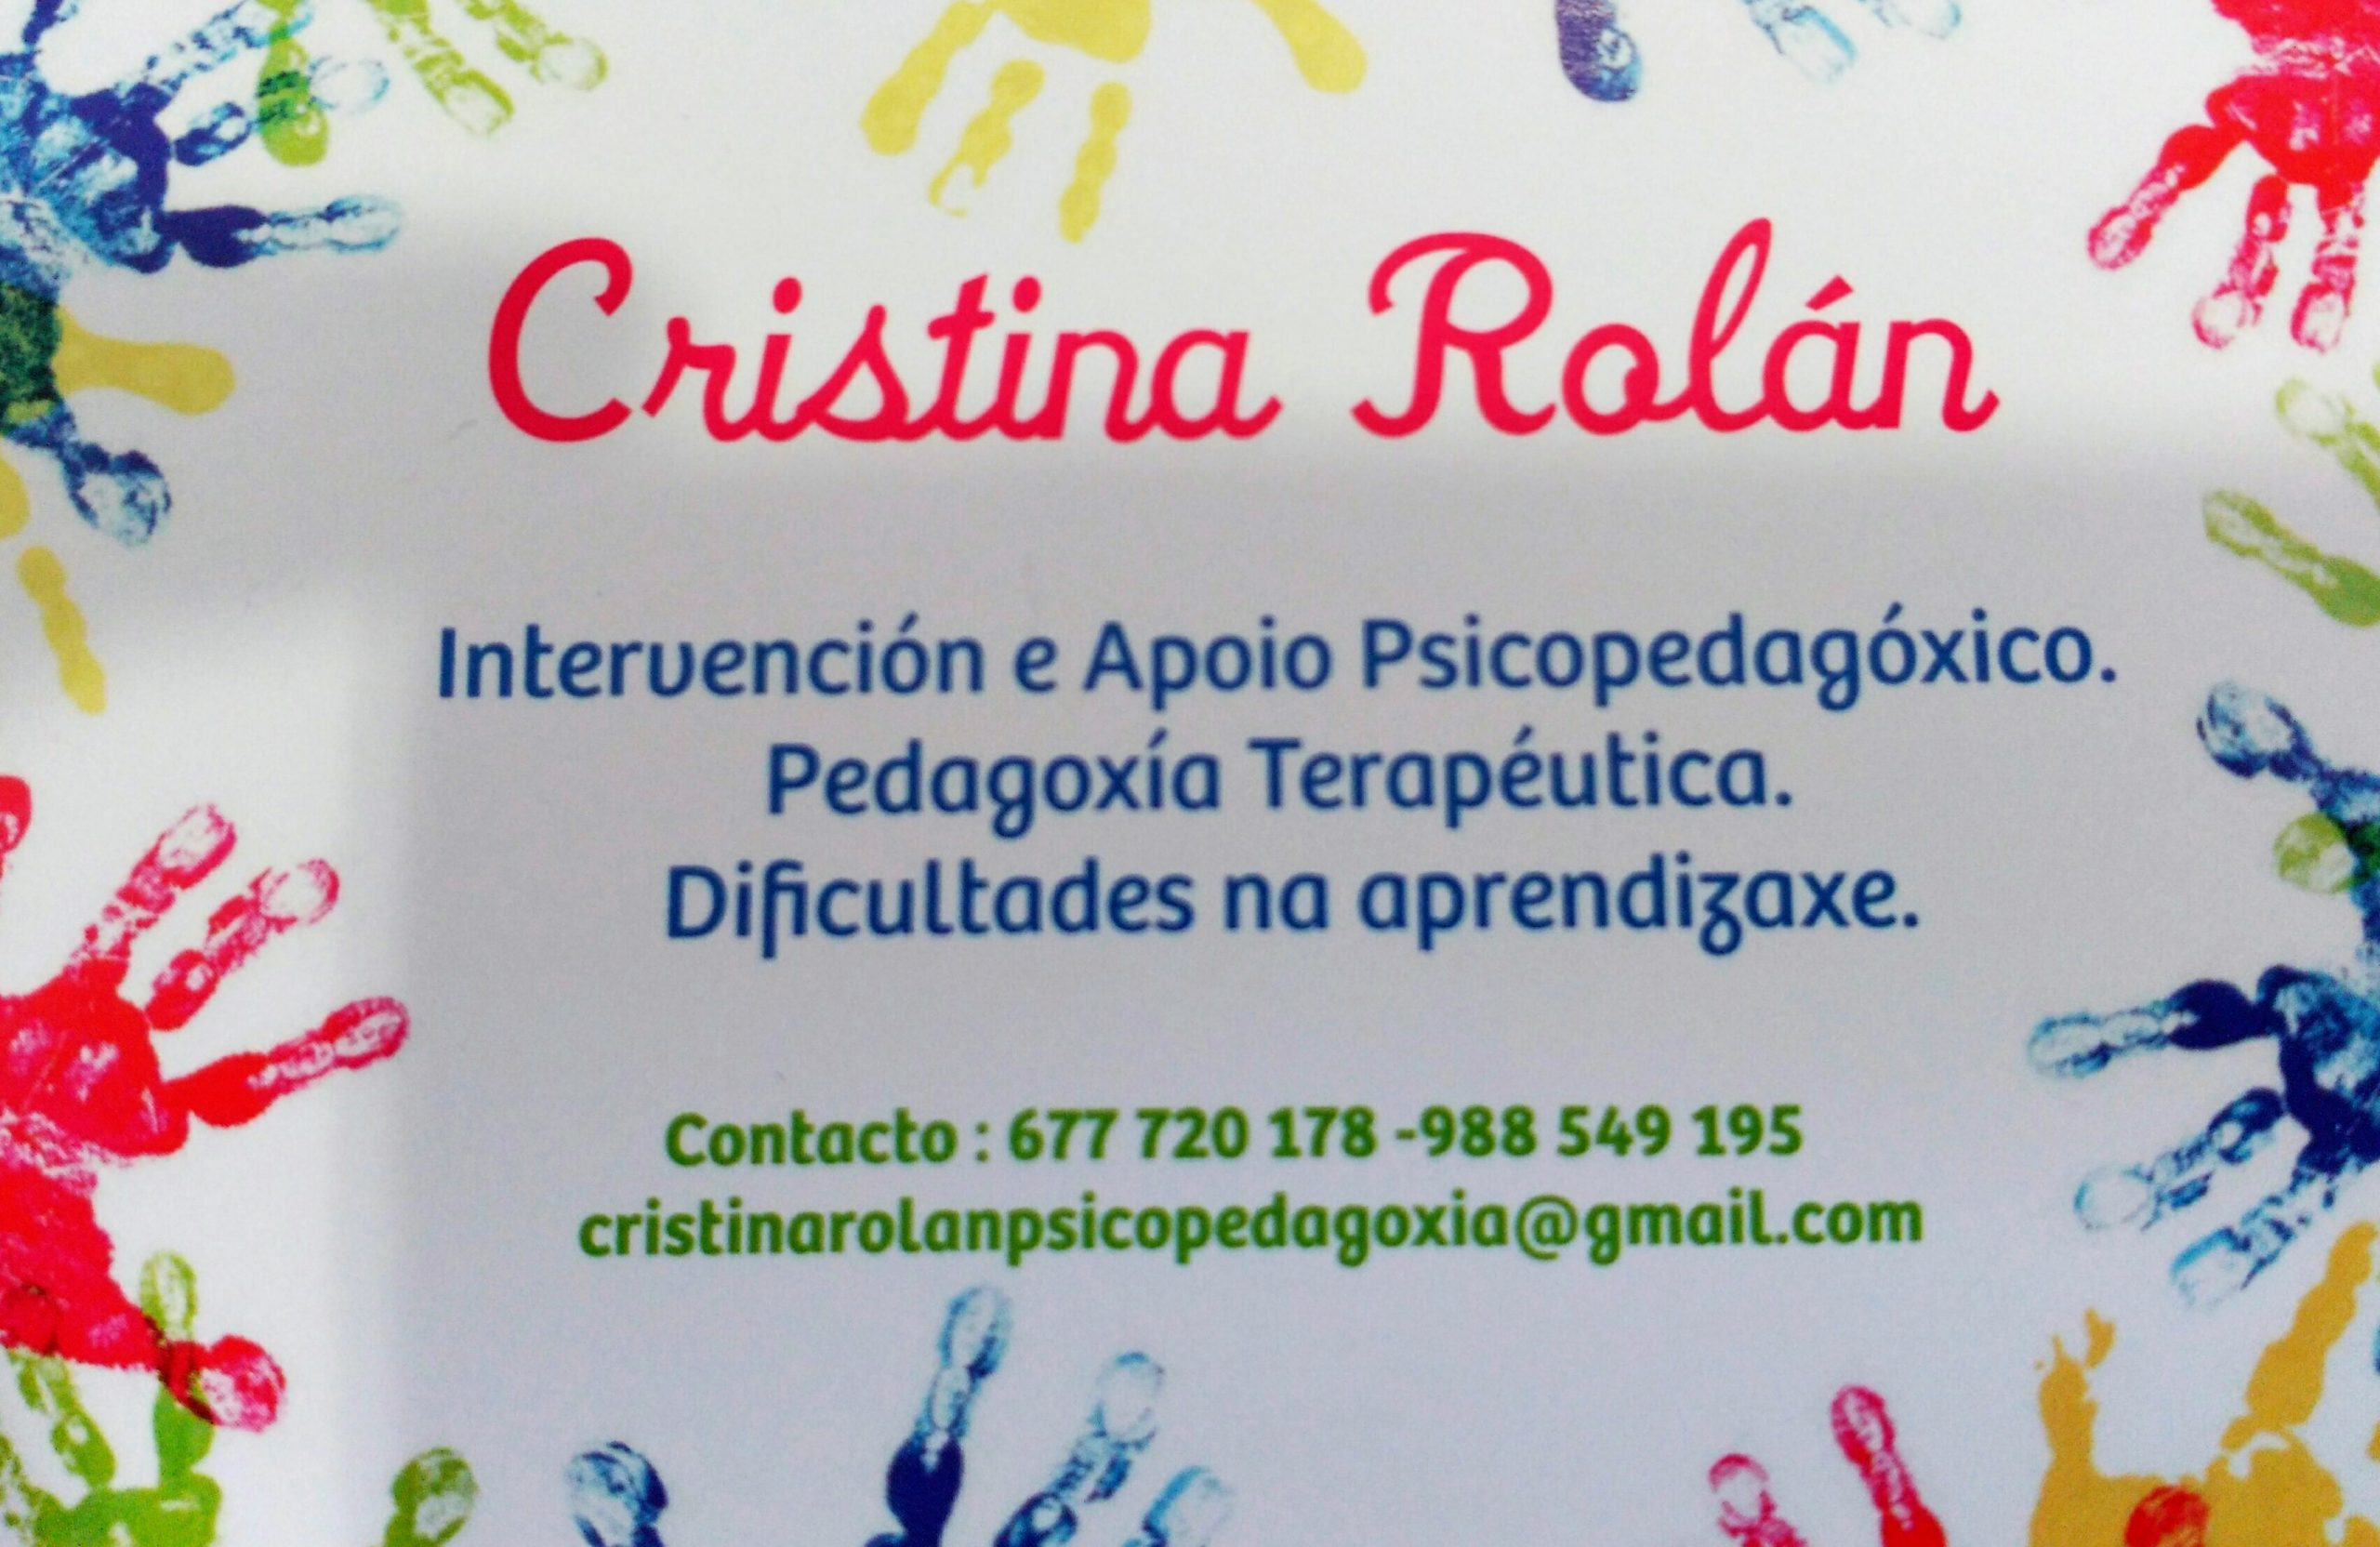 Cristina Rolán